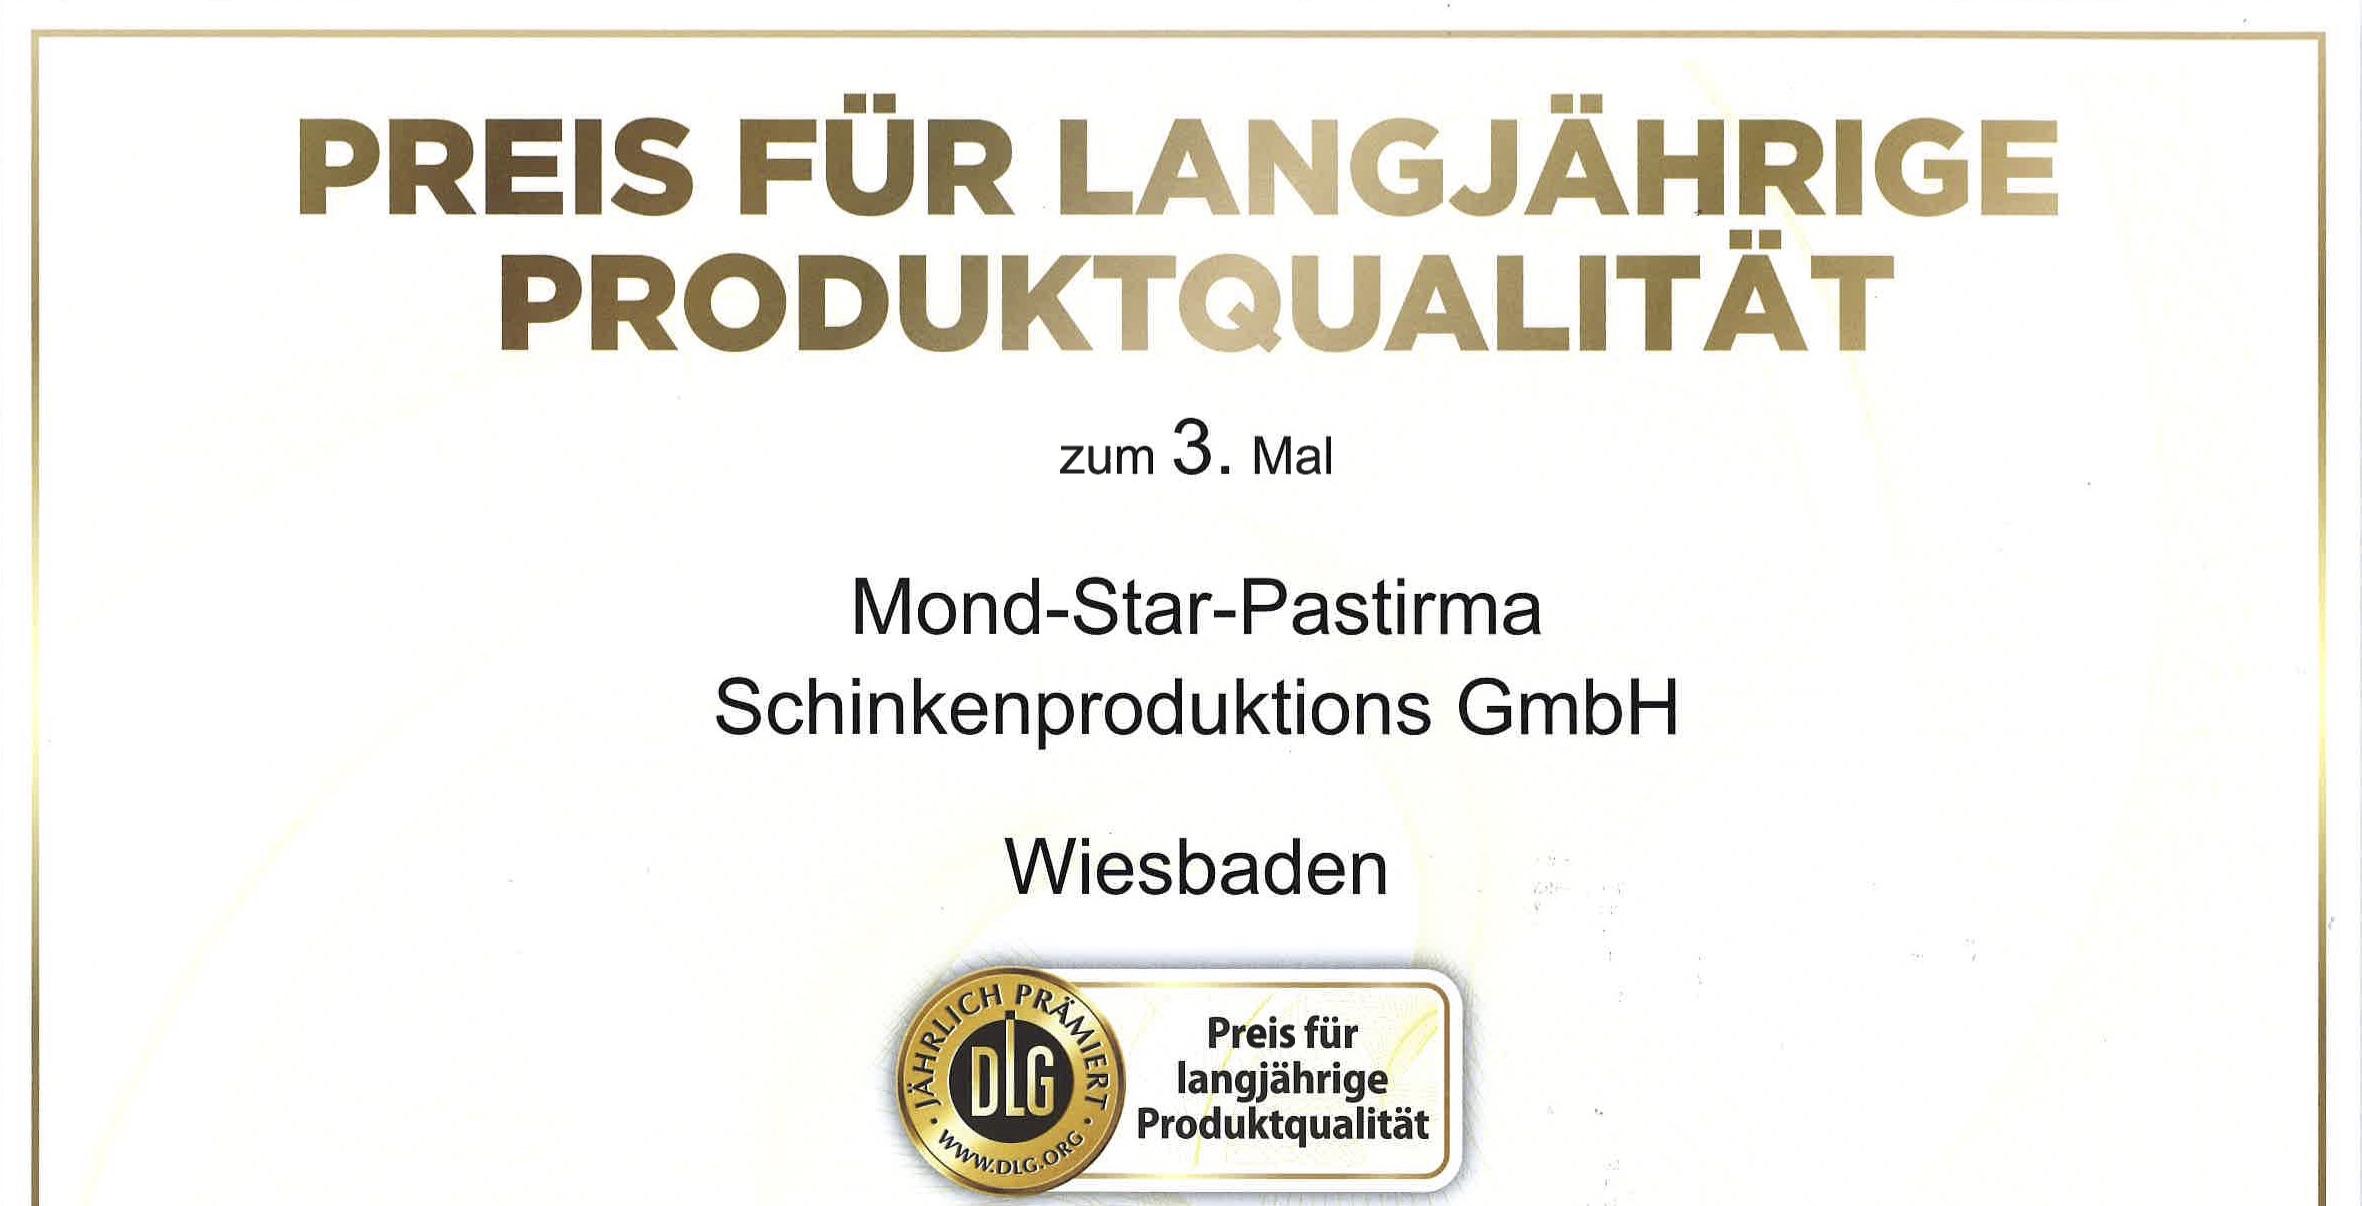 Öz Kayseri GmbH madalyaya doymuyor